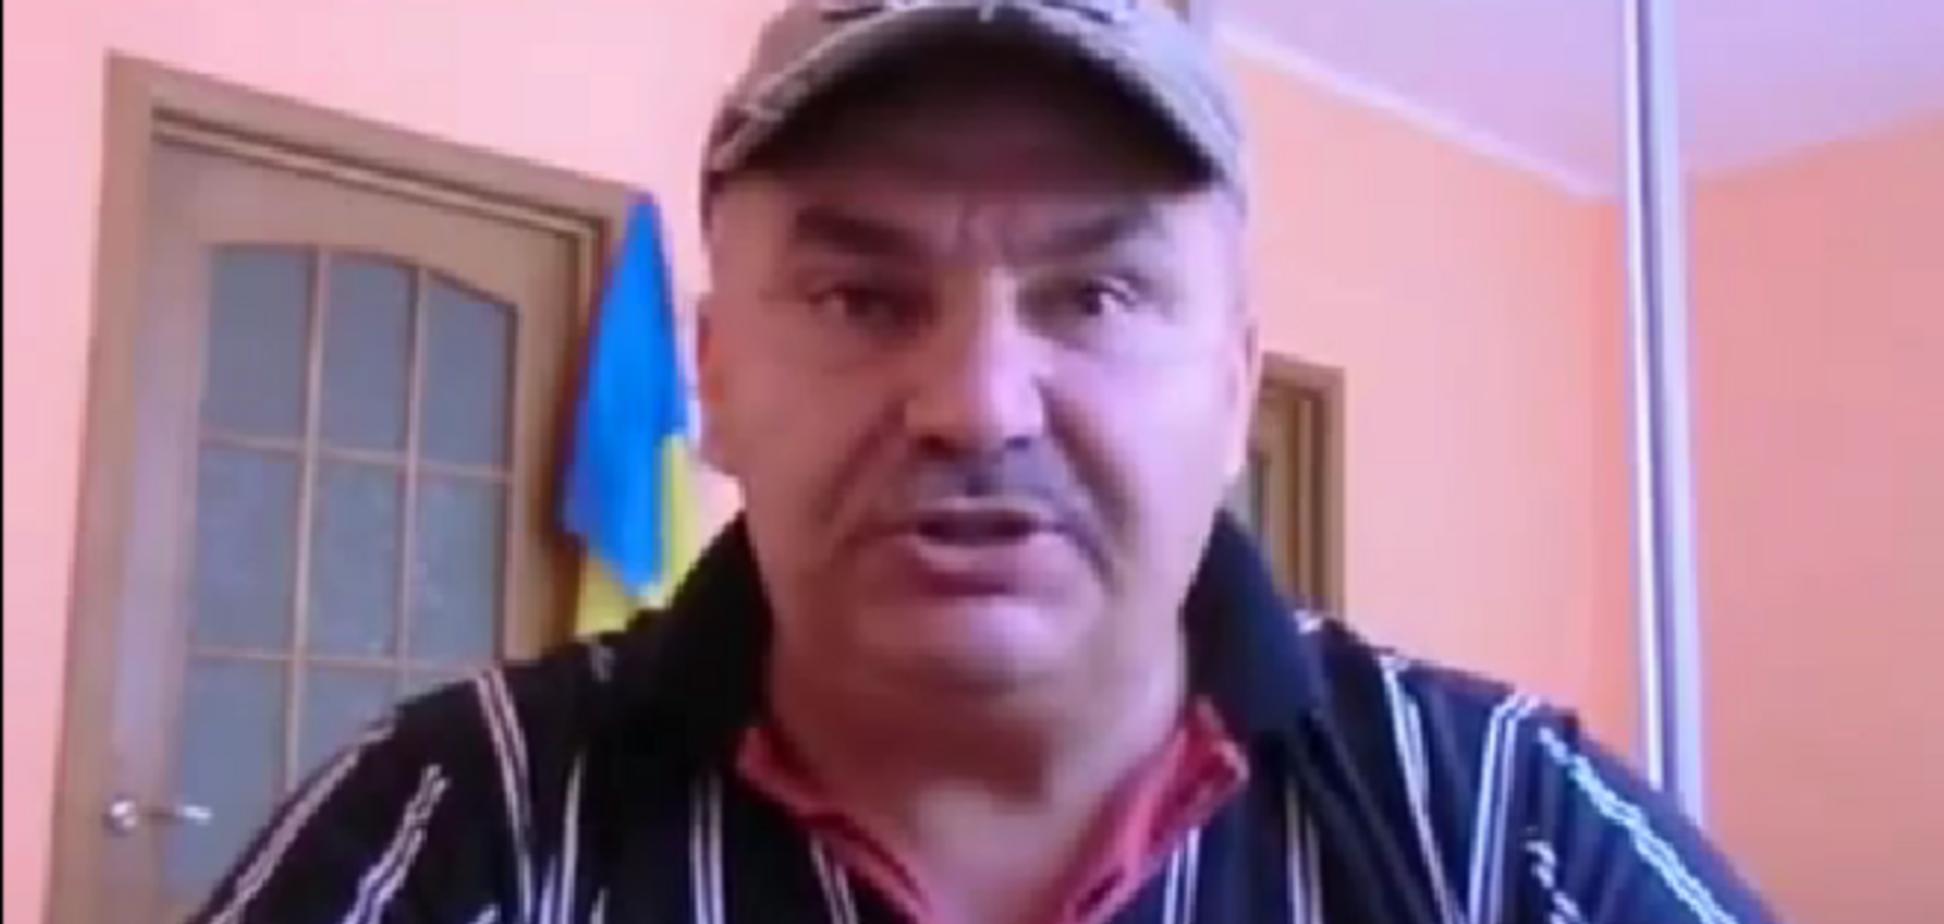 Появилось видео, где донецкий шахтер 'по-мужски' отчитал Путина